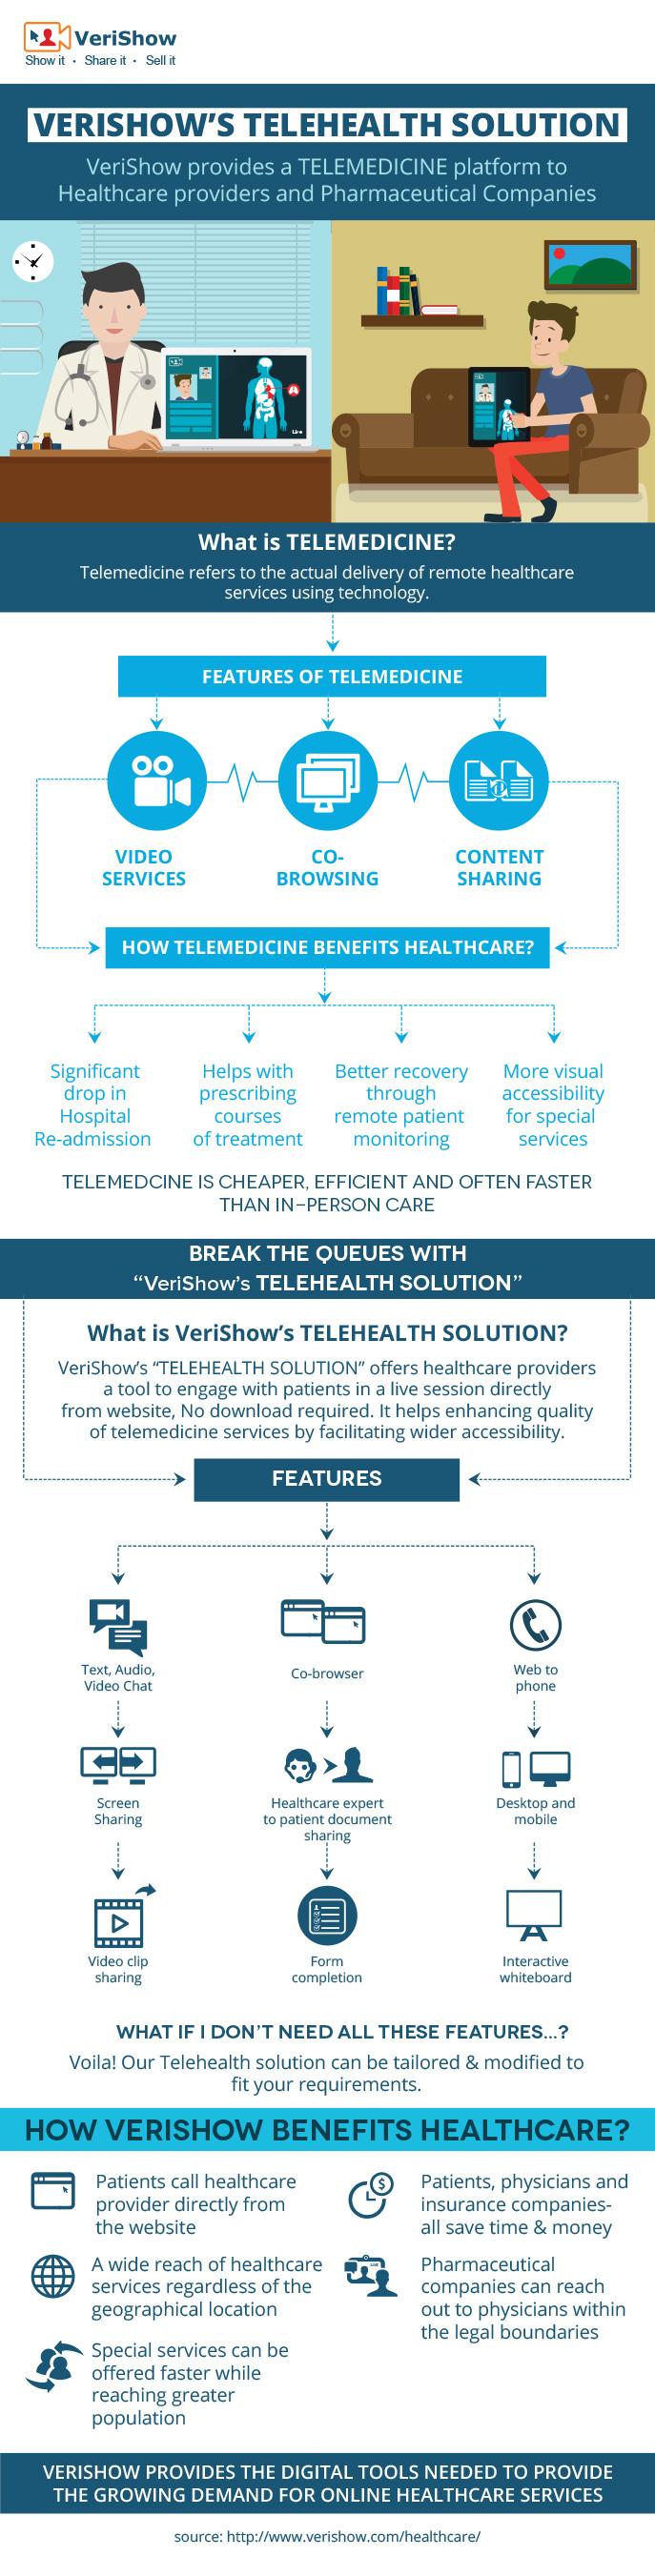 VeriShow Telehealth Solution Infographic